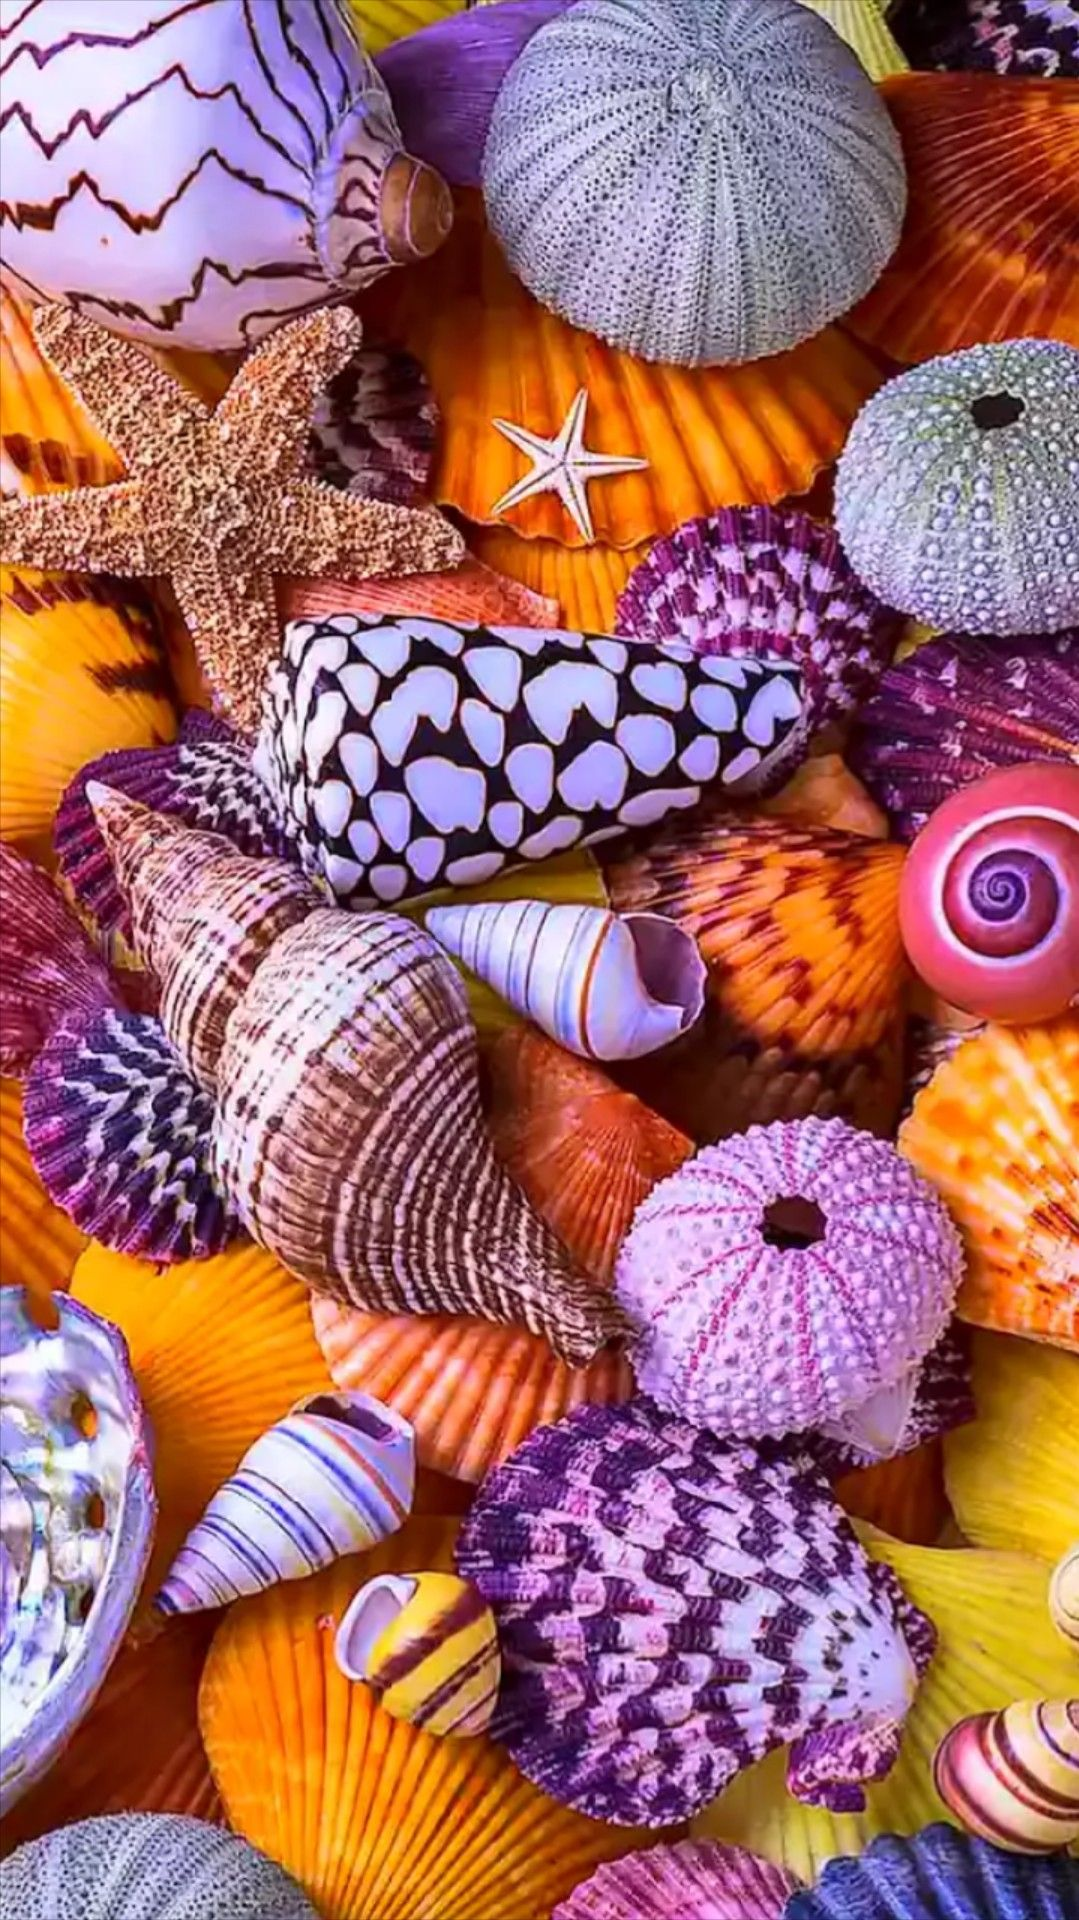 Pin By Kathy Yeager On Starfish Seashells Sea Shells Ocean Treasures Seashell Crafts